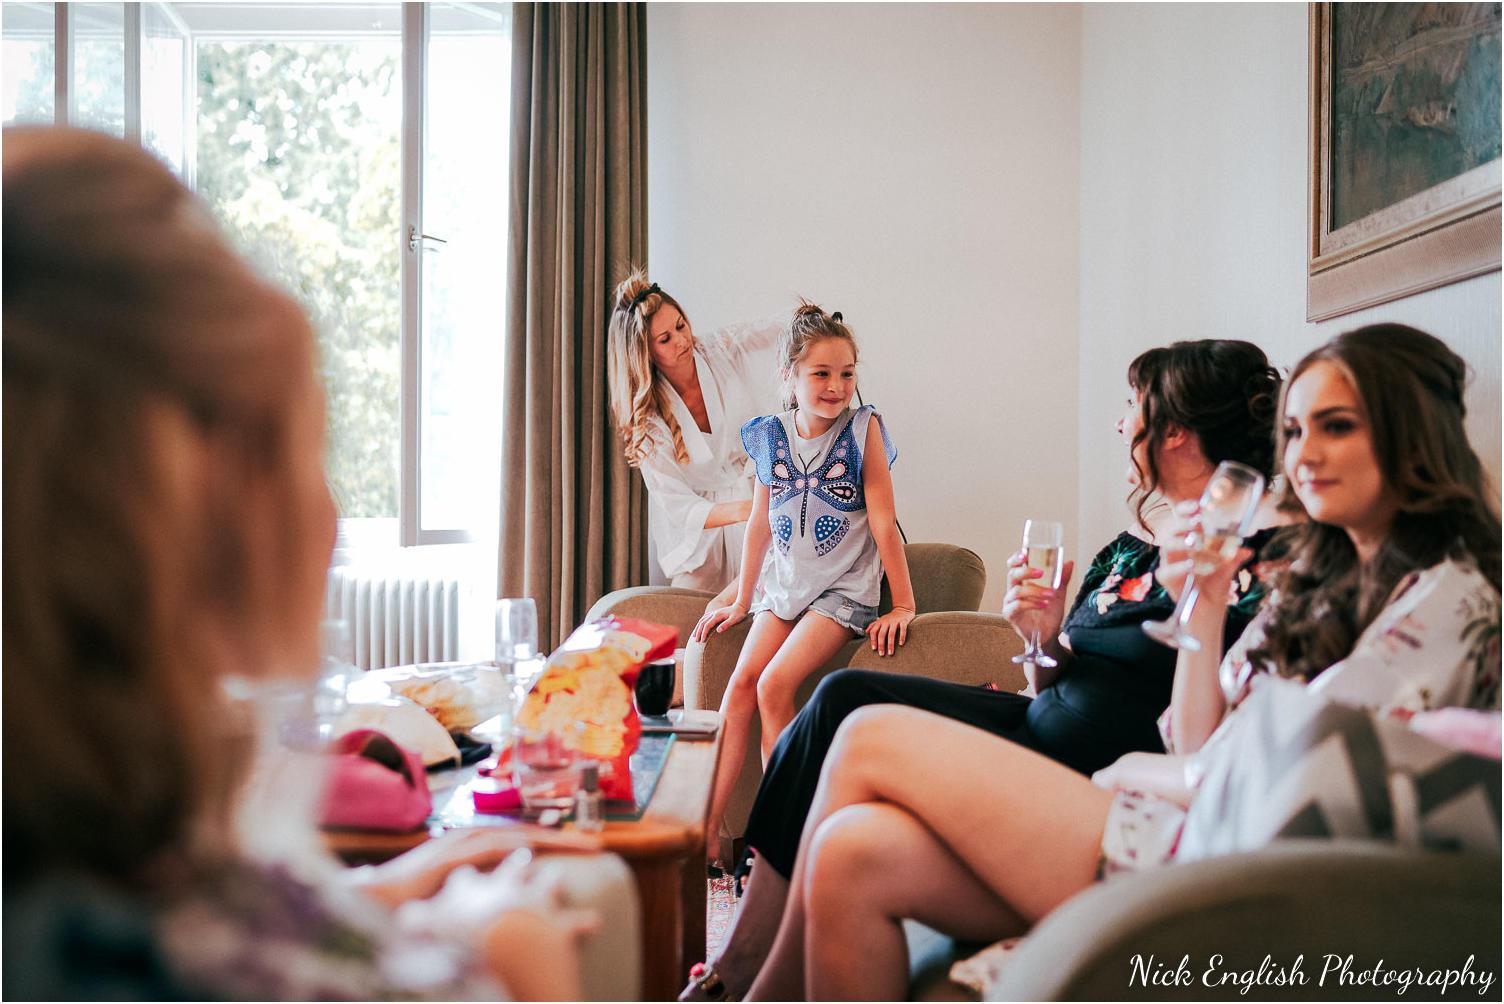 Destination_Wedding_Photographer_Slovenia_Nick_English_Photography-4.jpg